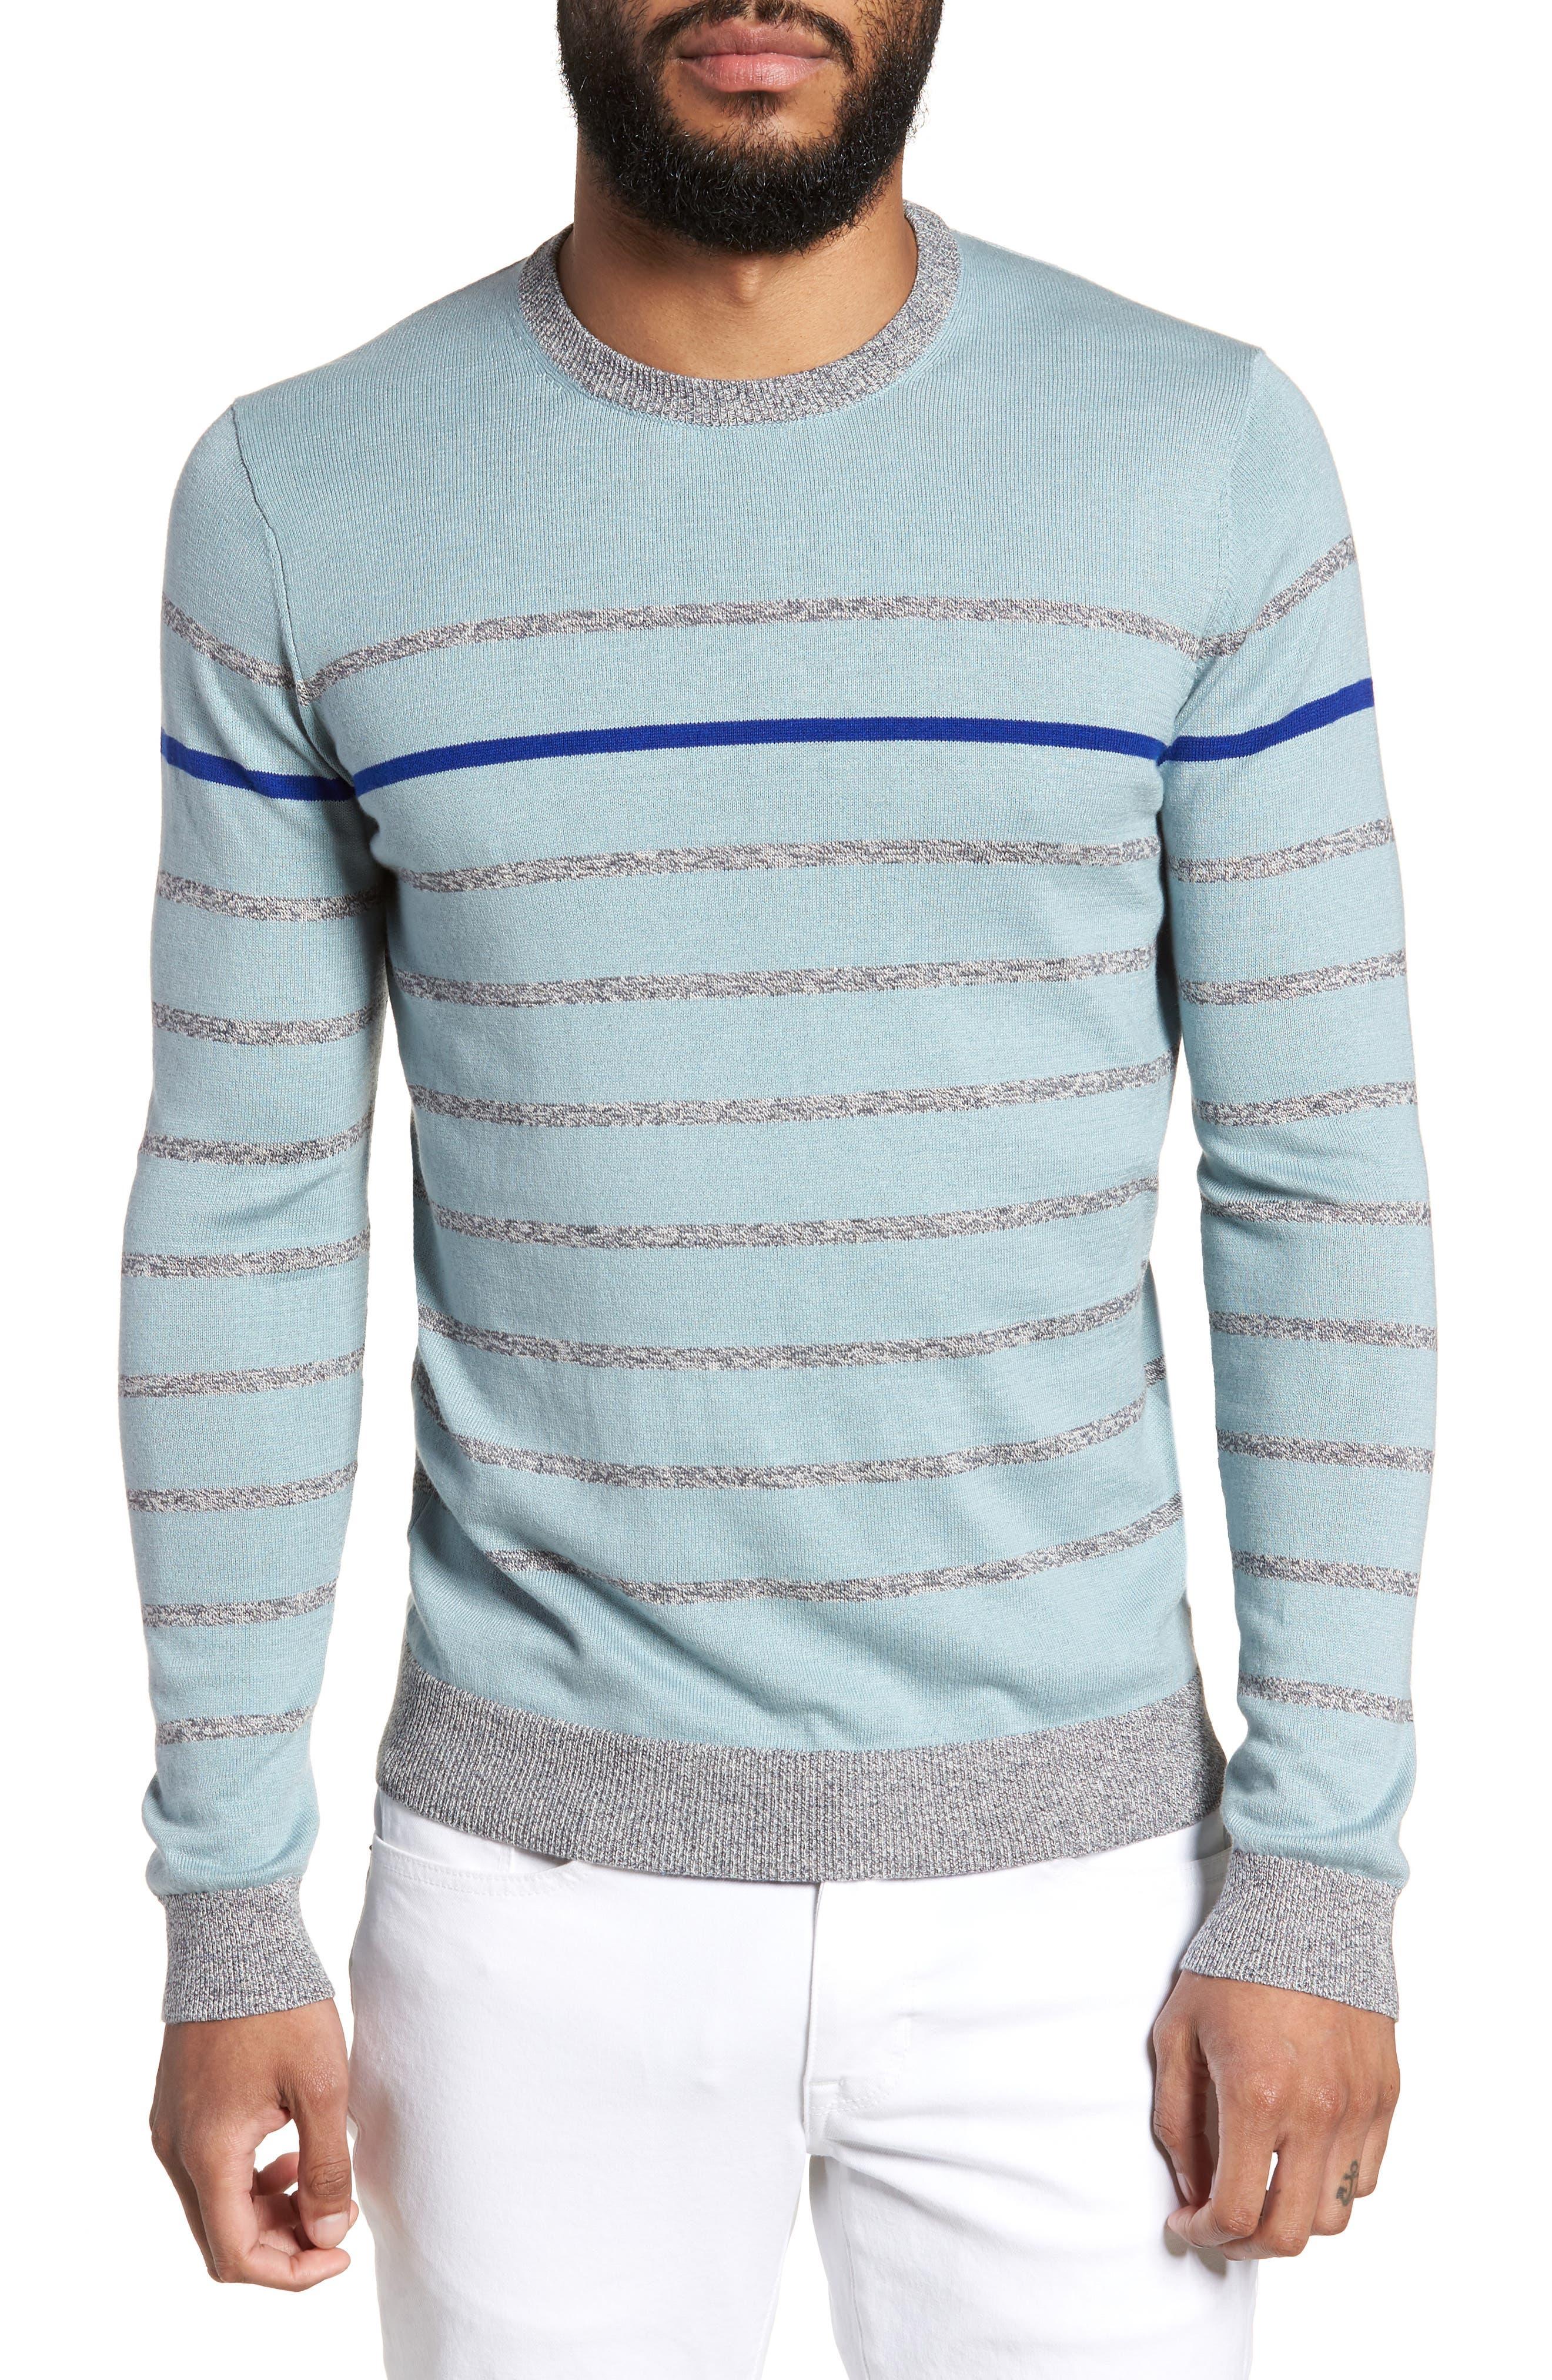 Britnay Trim Fit Stripe Crewneck Sweater,                             Main thumbnail 1, color,                             400